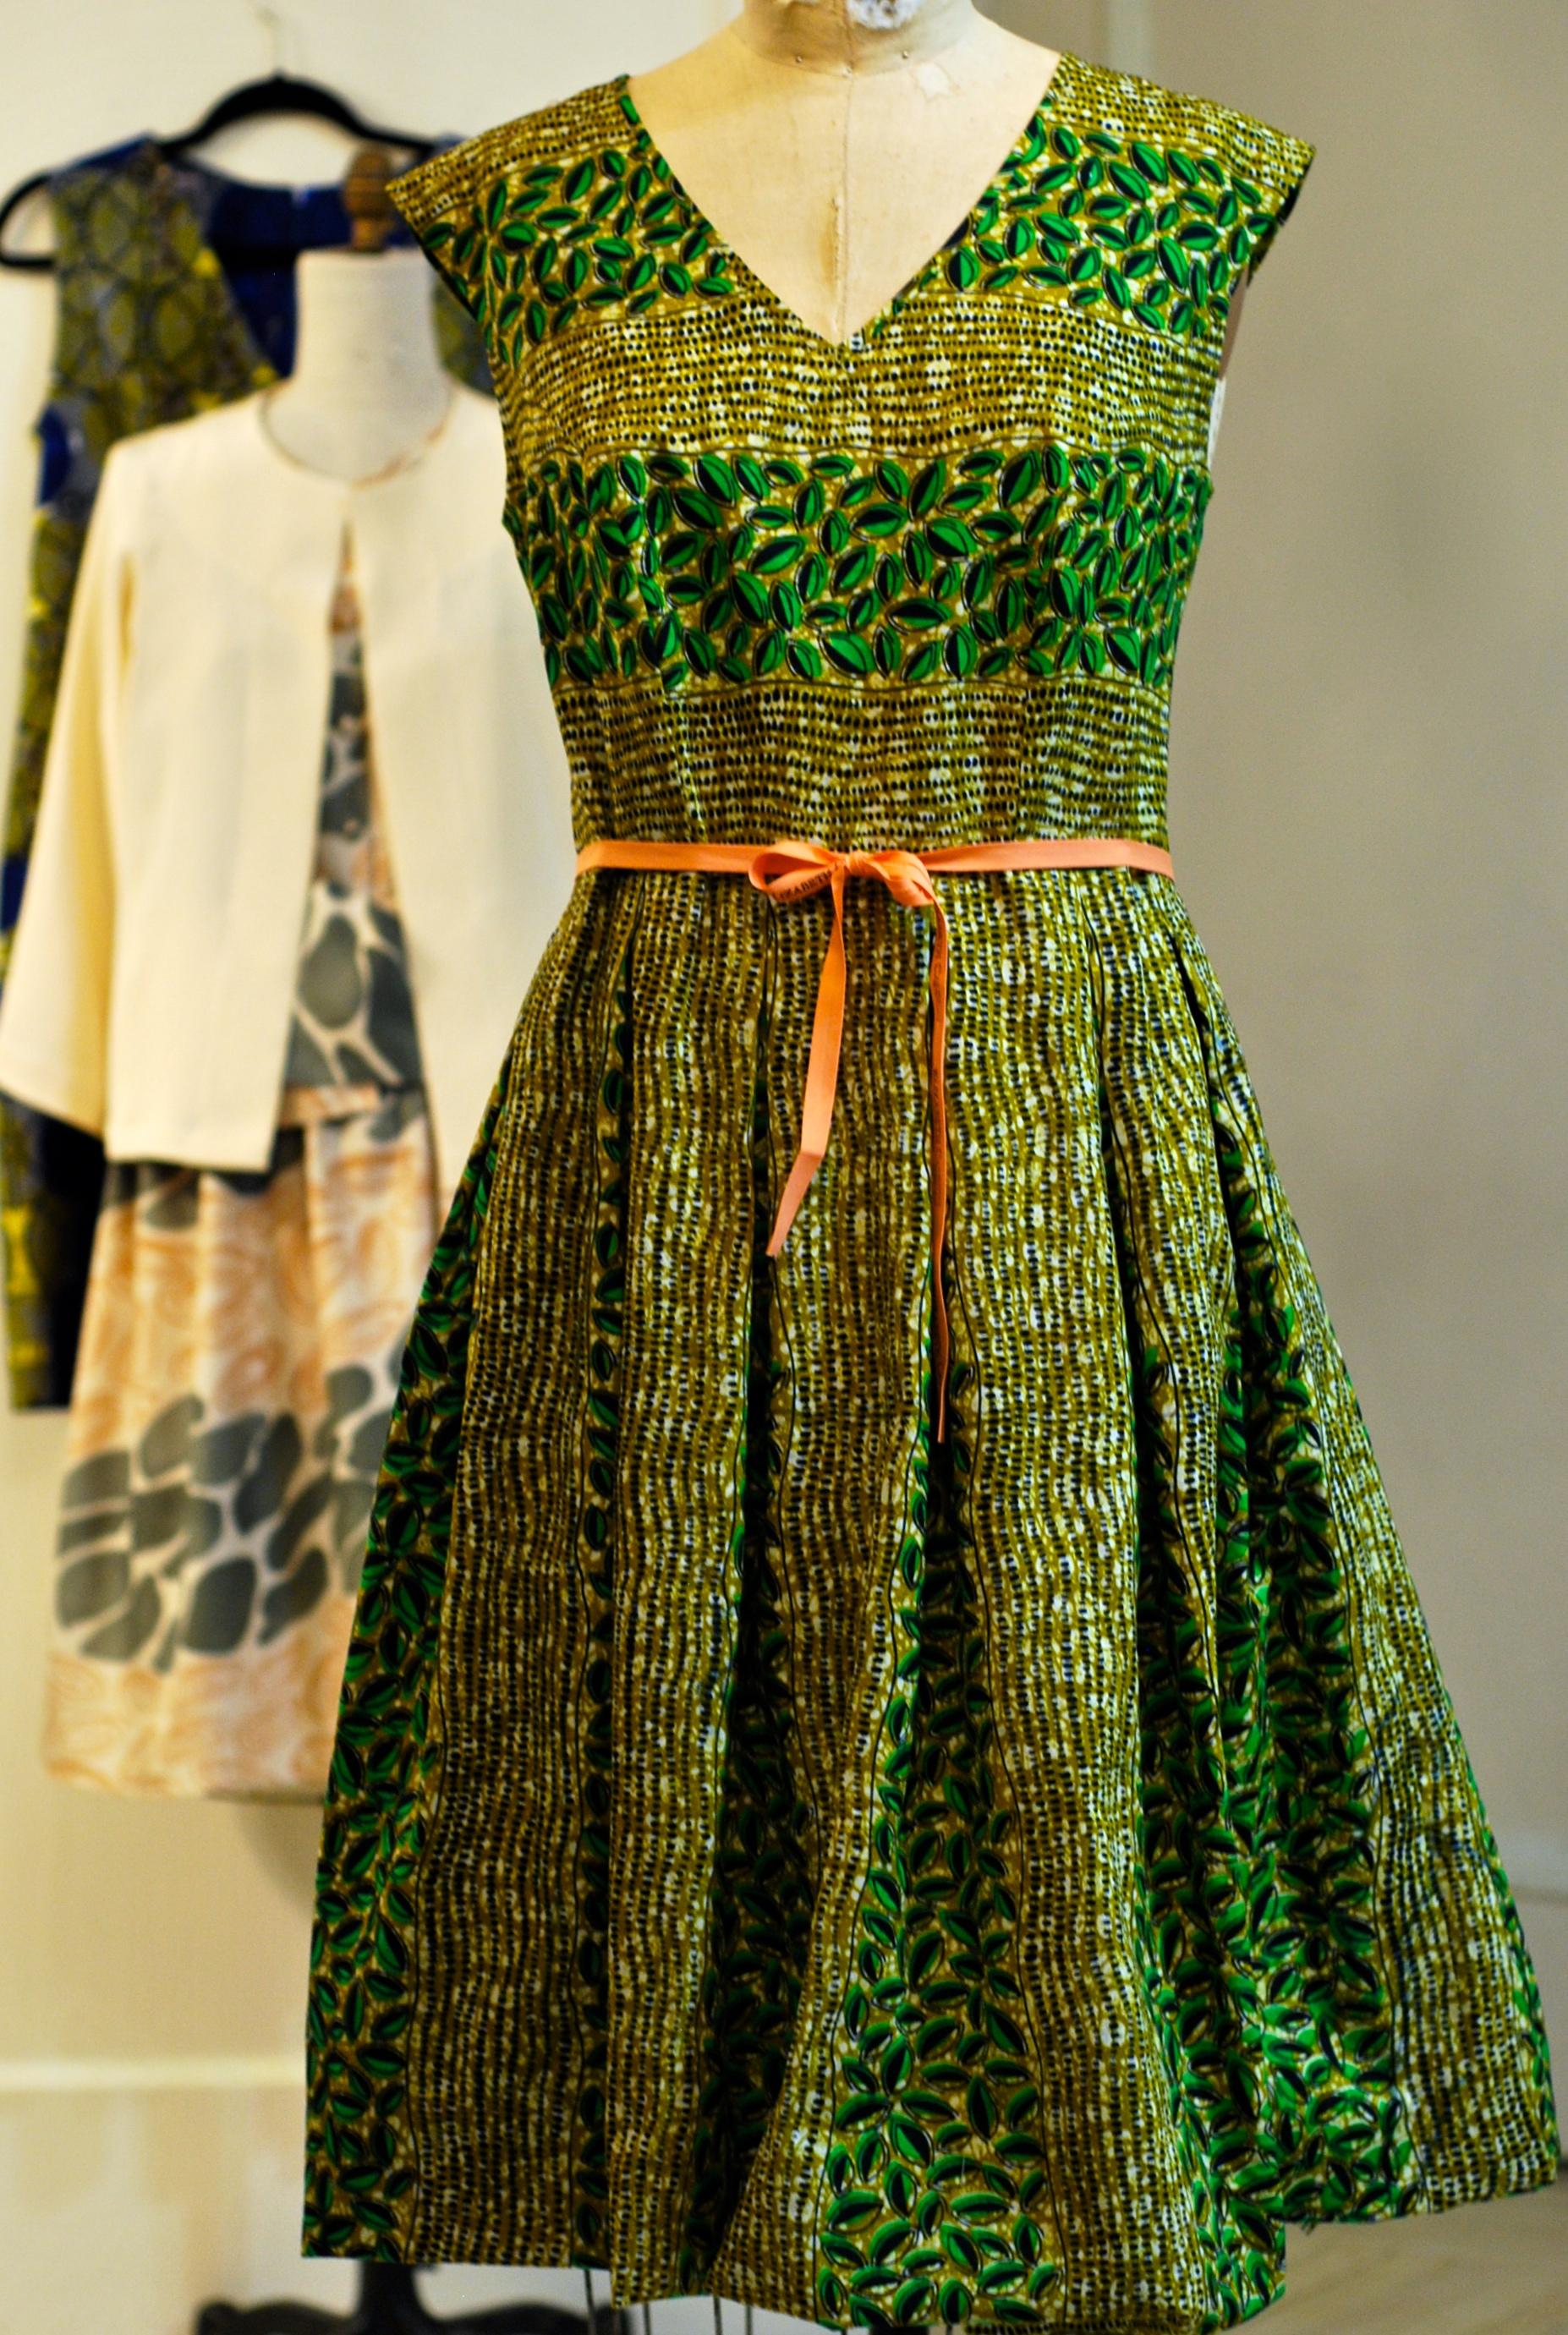 green leaf dress.jpg